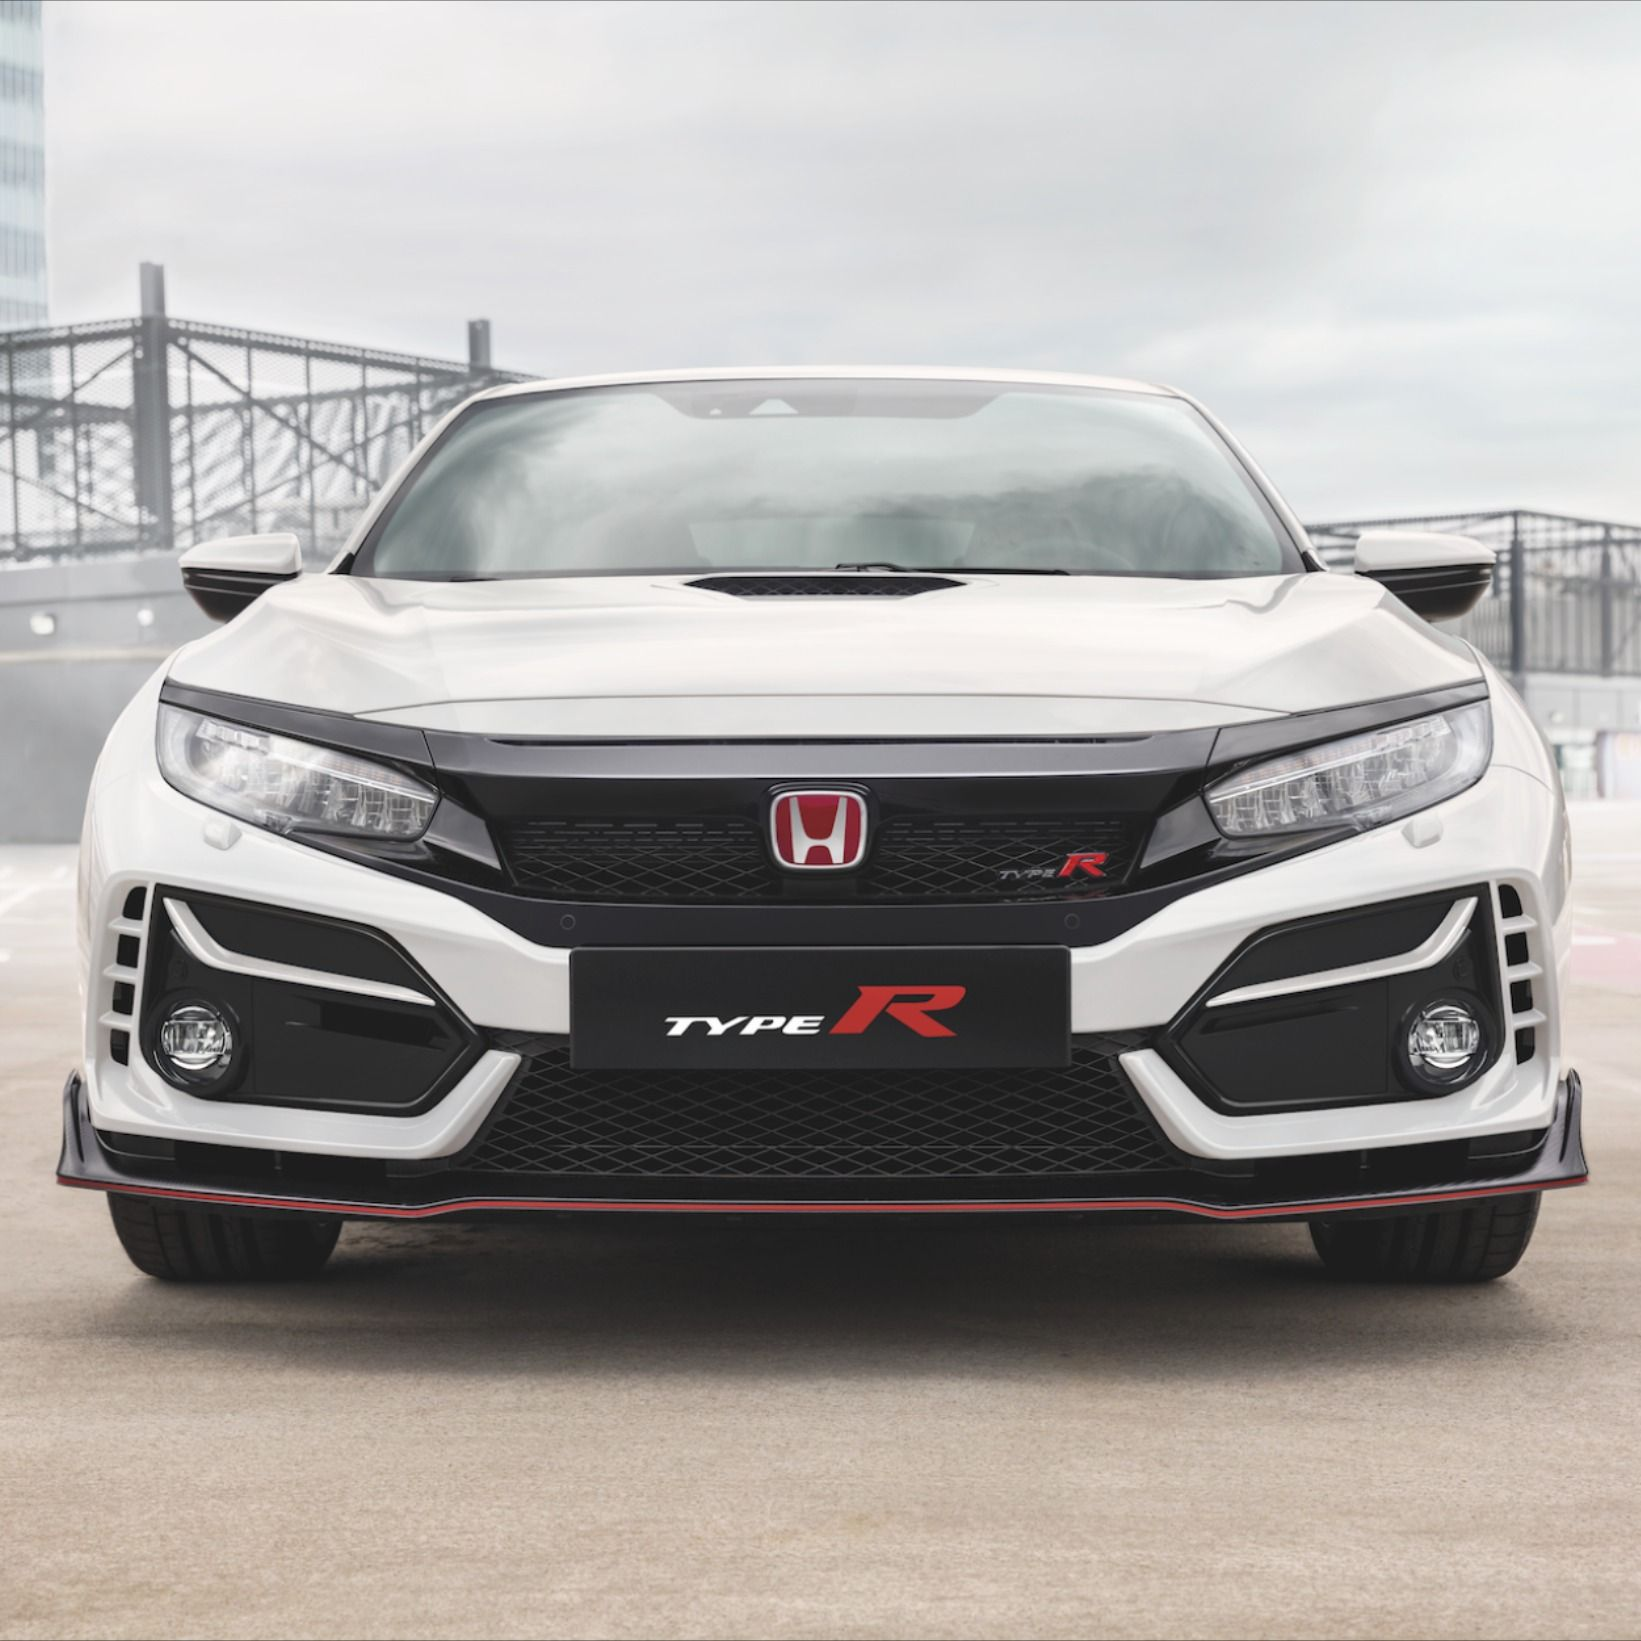 2018 Civic Type R White